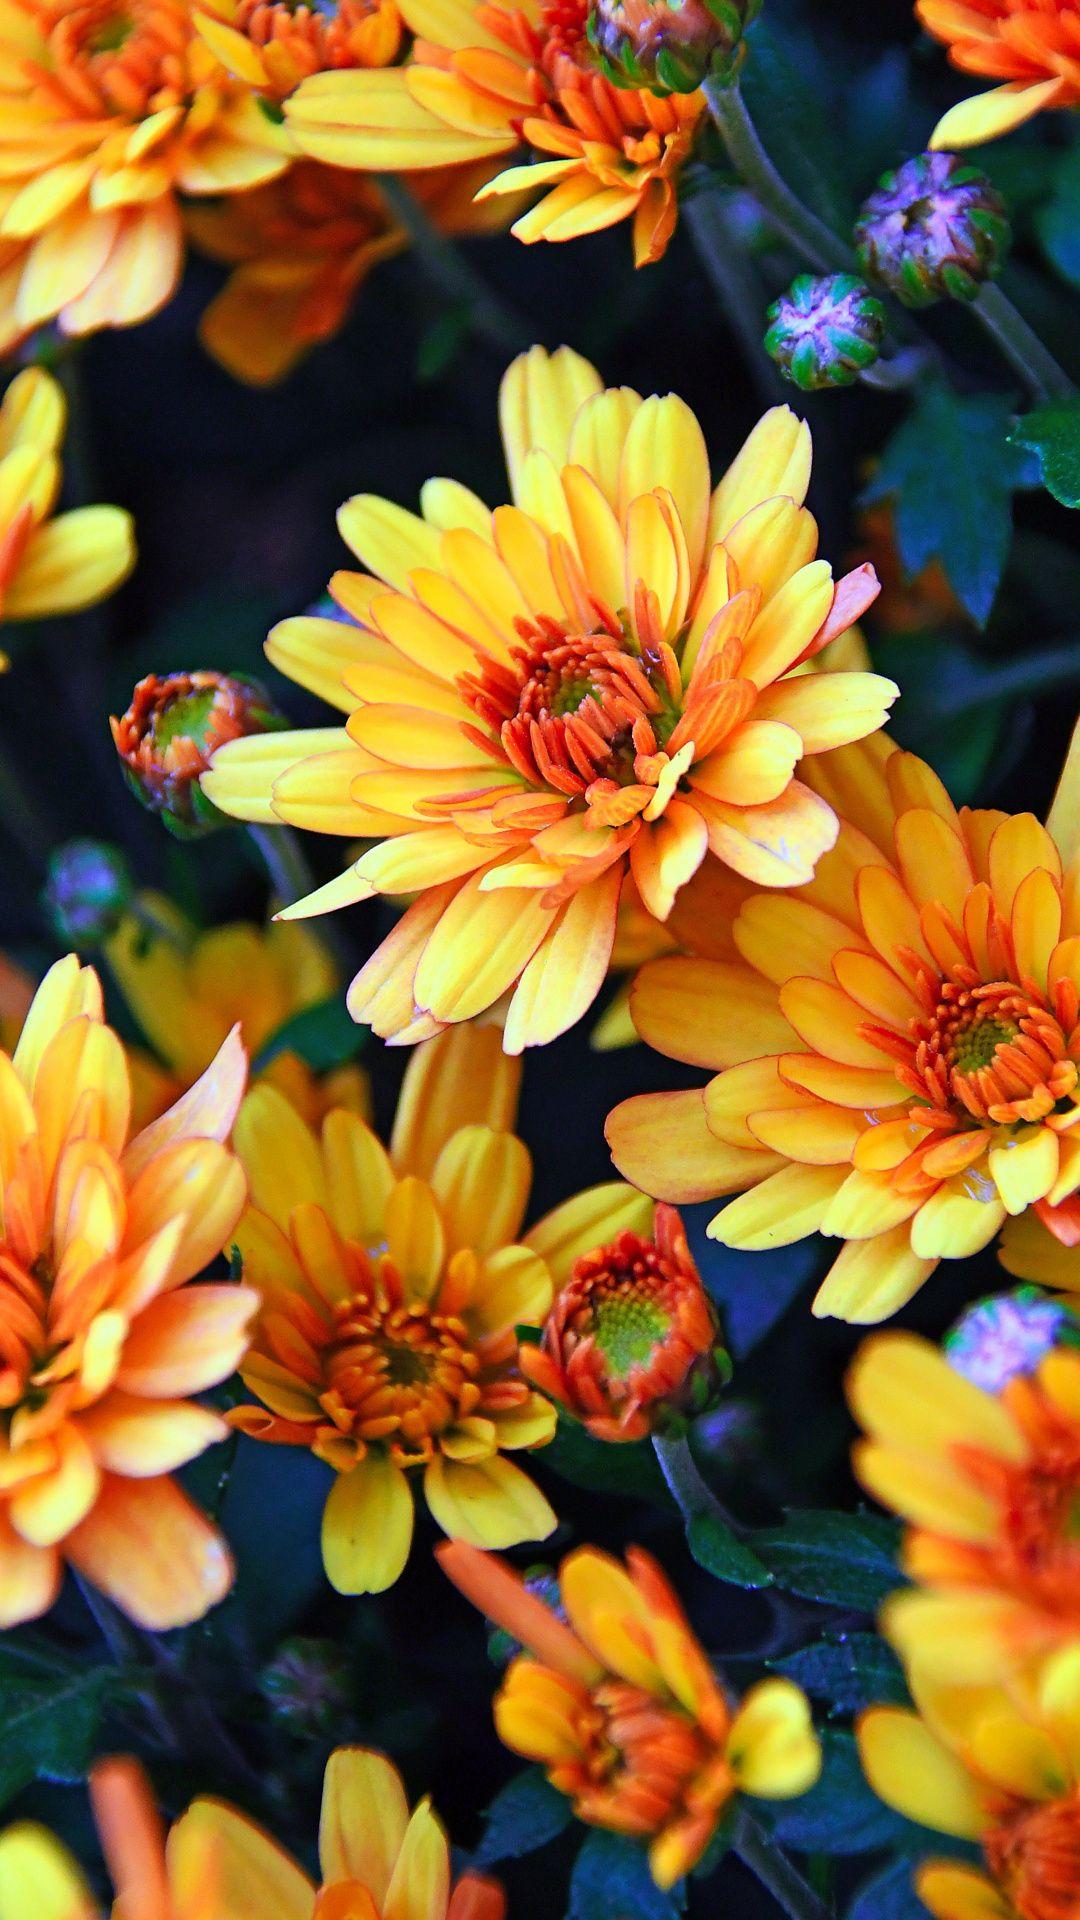 Autumn Yellow Flowers Chrysanthemum 1080x1920 Wallpaper Flower Iphone Wallpaper Wallpaper App Flower Phone Wallpaper